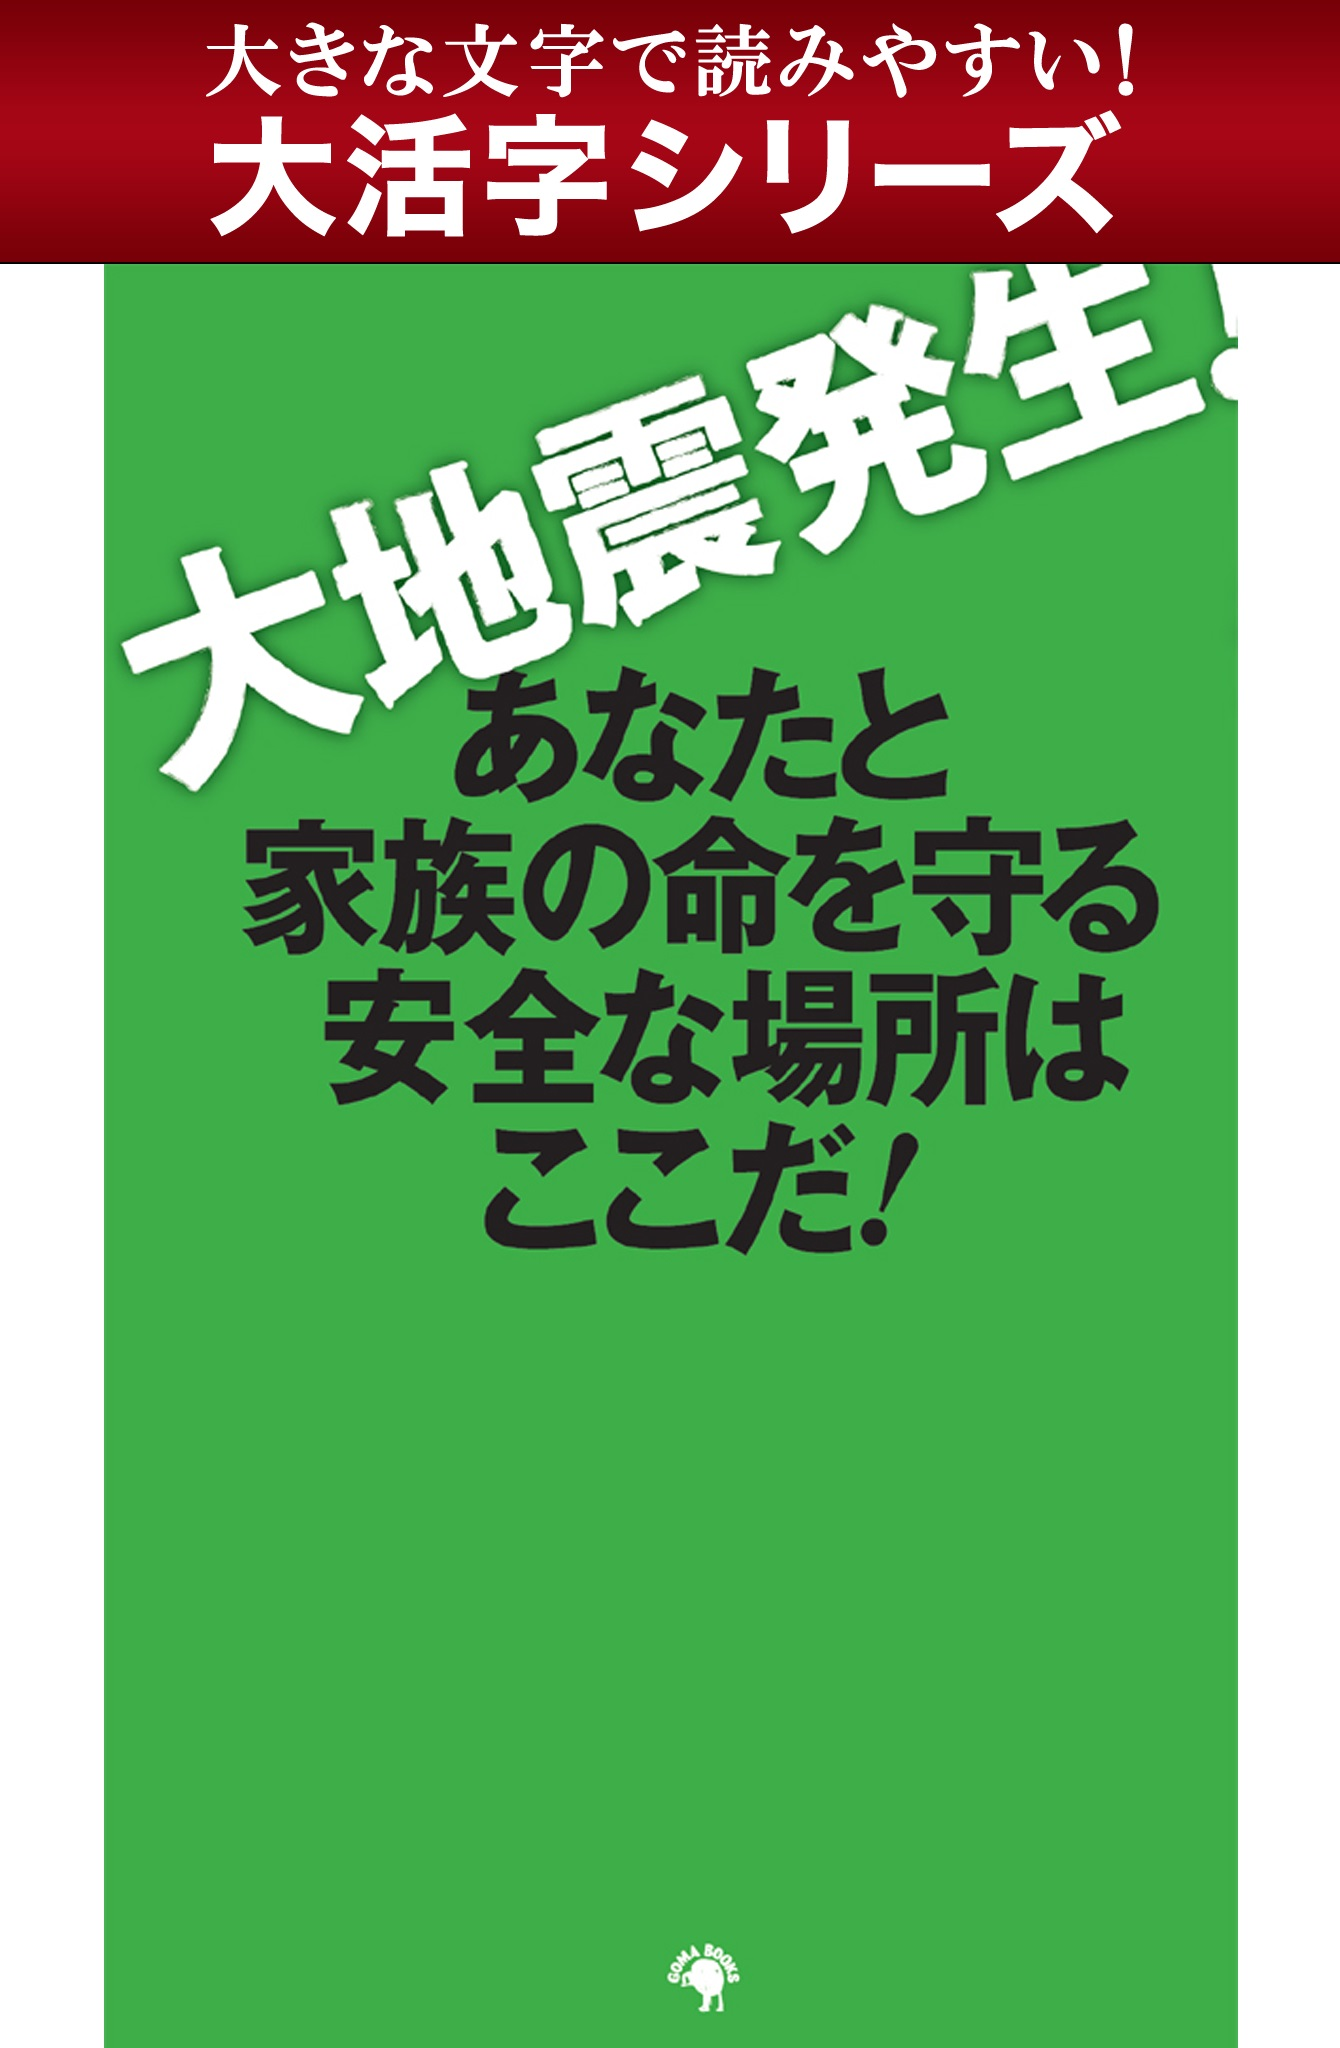 【android/kindle端末対応 大活字シリーズ】大地震発生! あなたと家族の命を守る安全な場所はここだ!